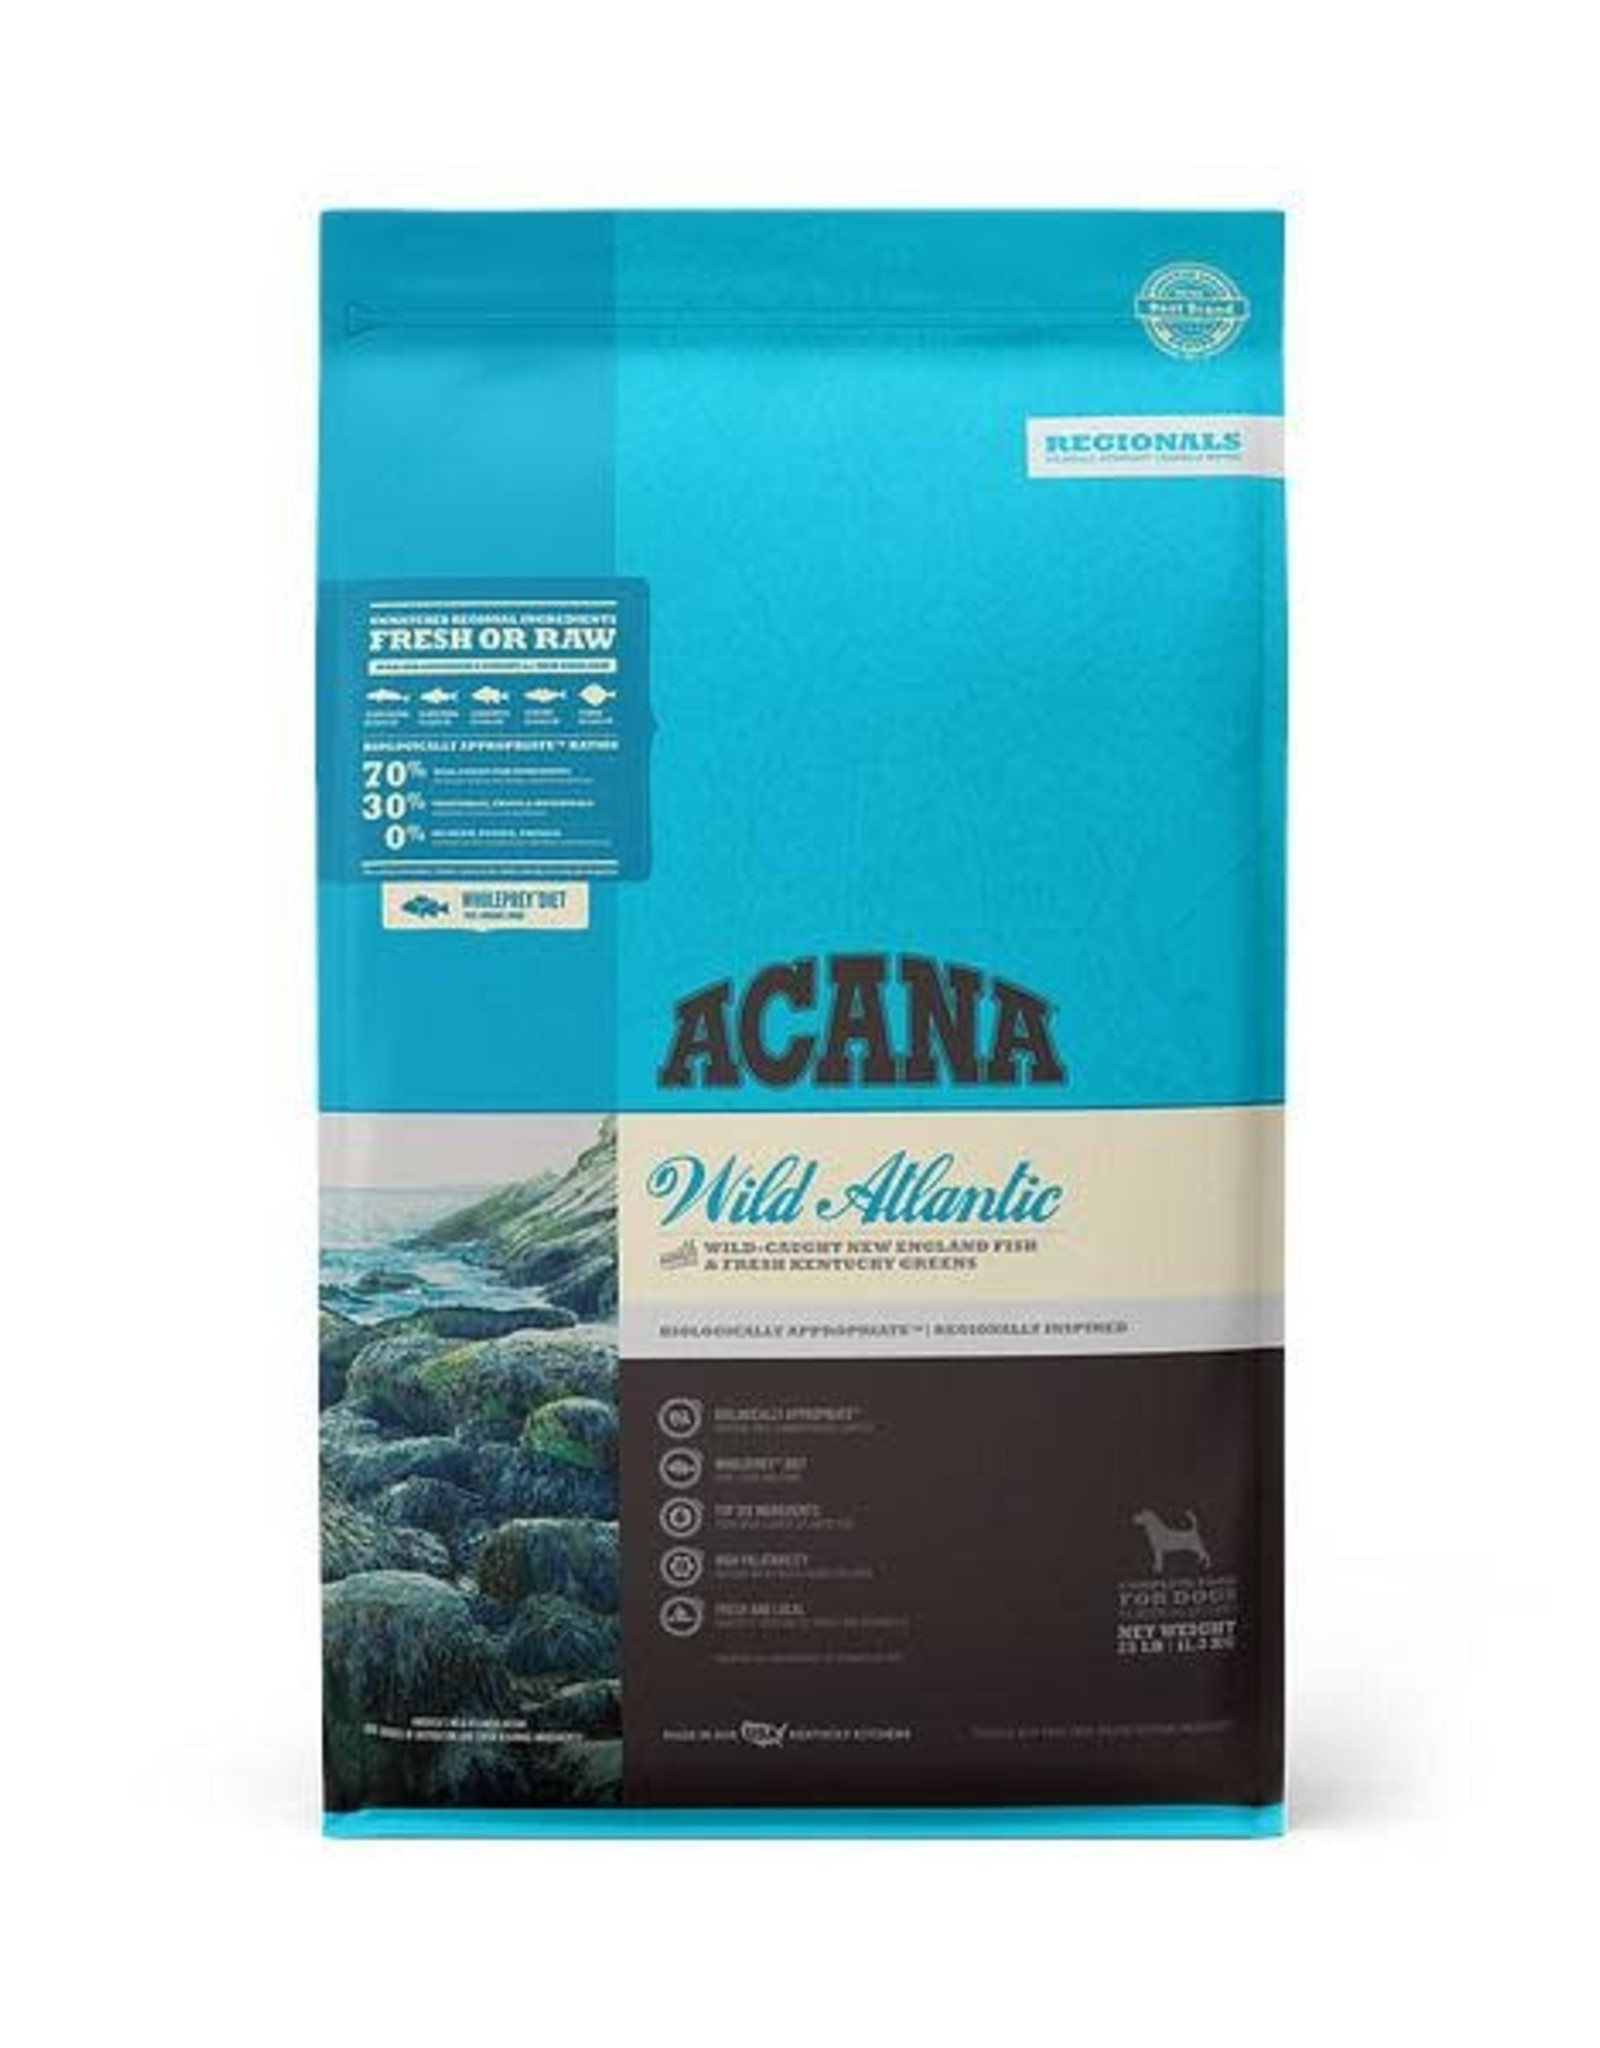 Acana Acana Wild Atlantic Grain Free High Protein Freeze-Dried Coated Fish Dry Dog Food, 25 lb